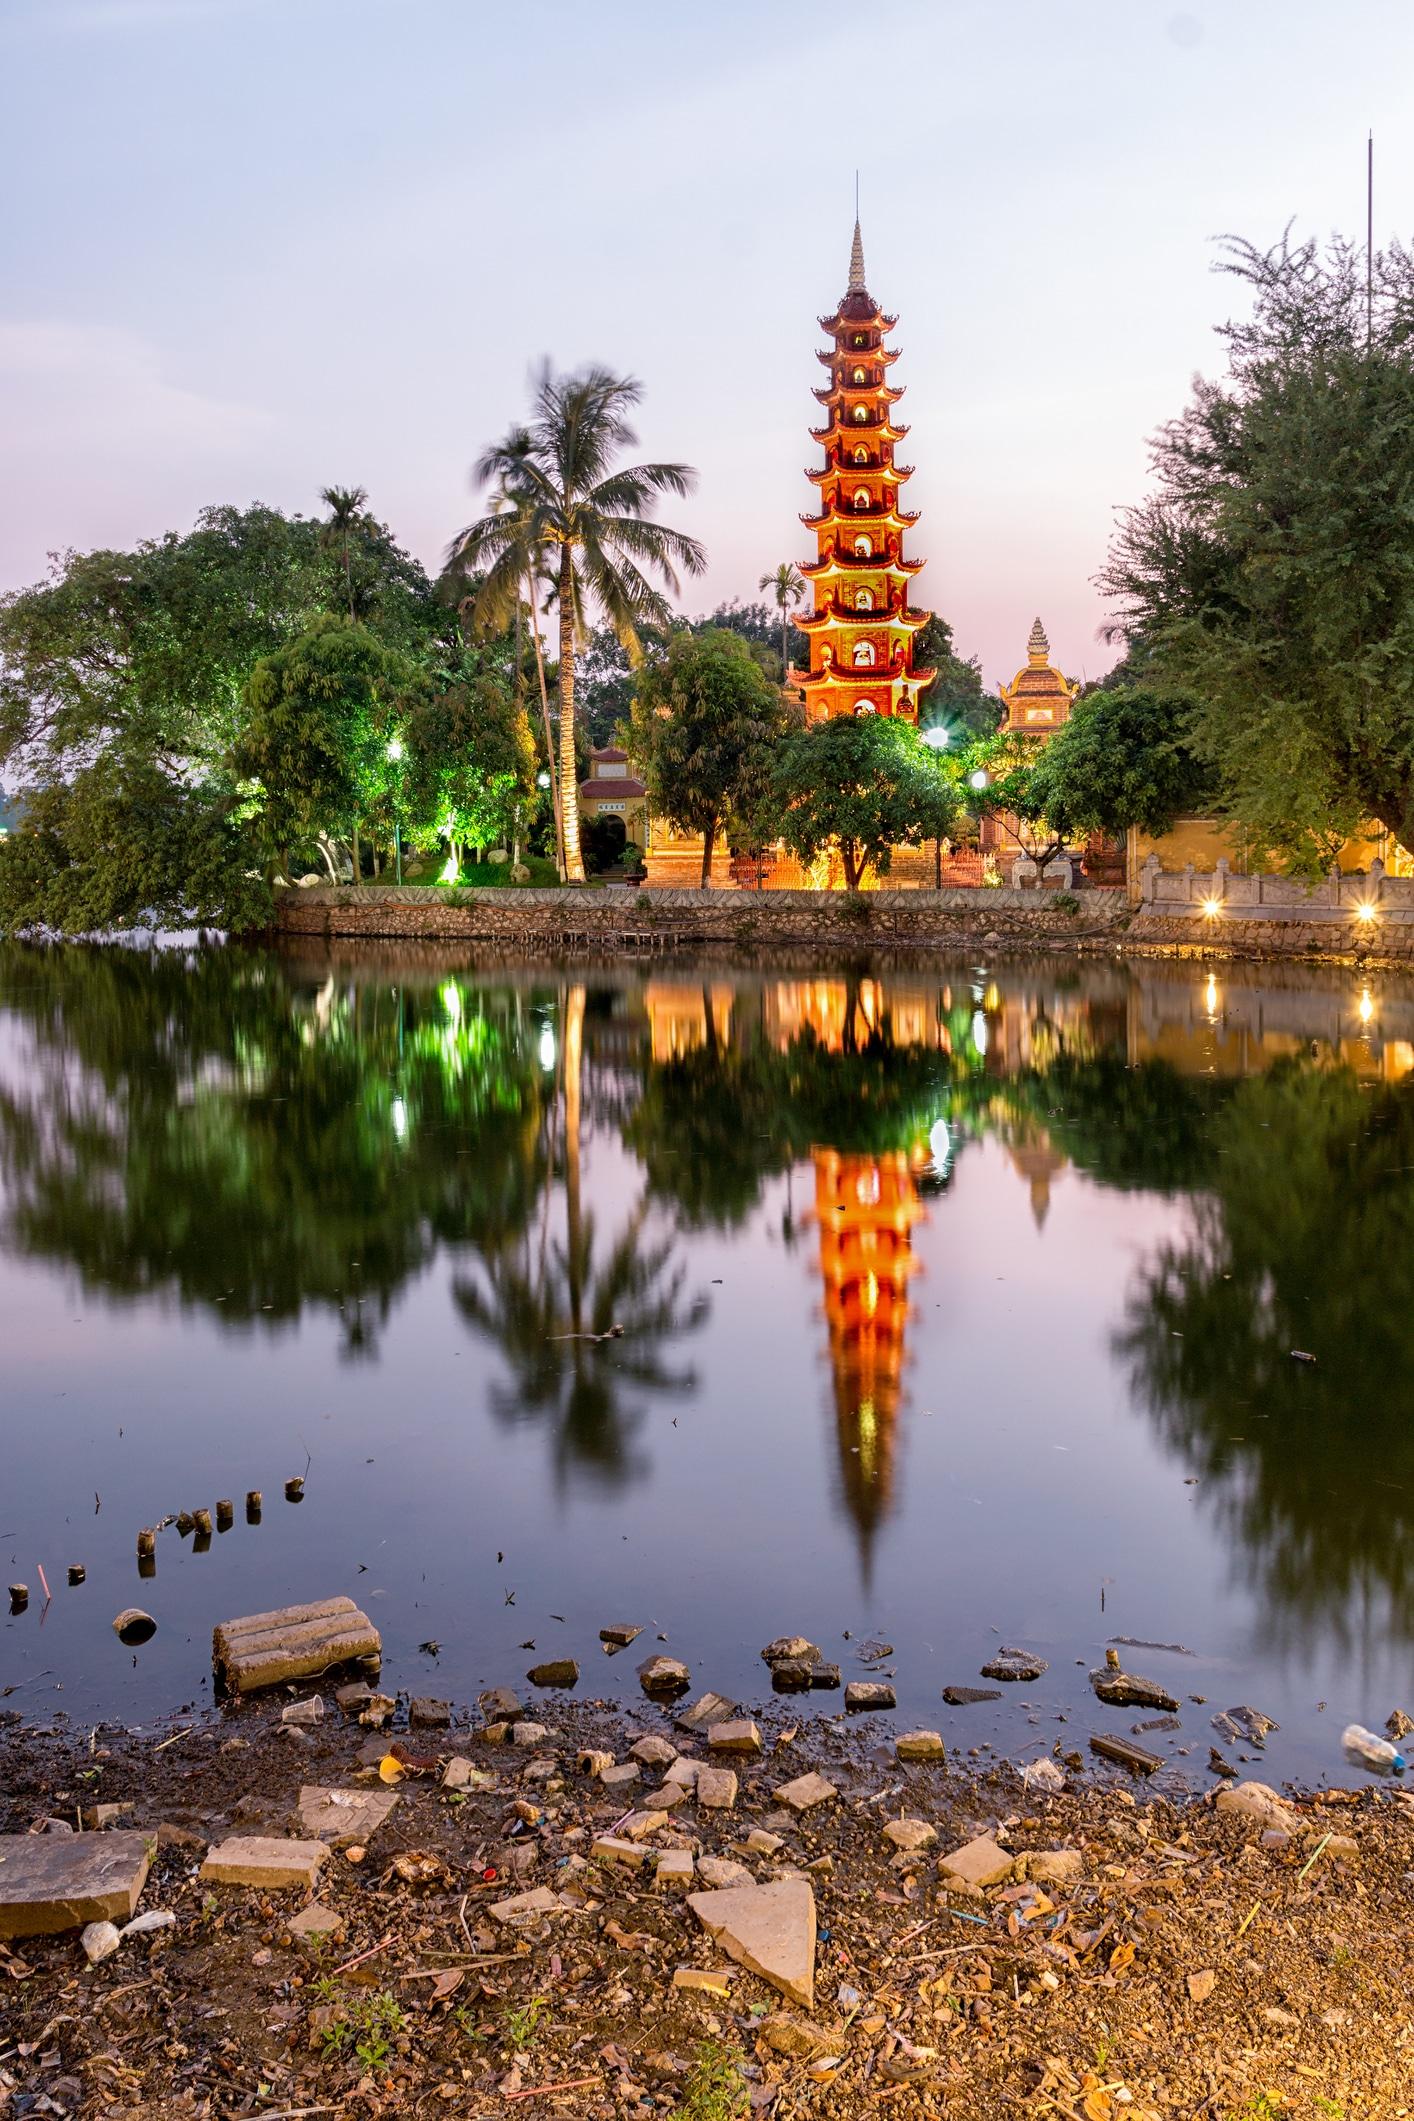 Tran Quoc Pagoda Twilight - West Lake - Hanoi, Vietnam